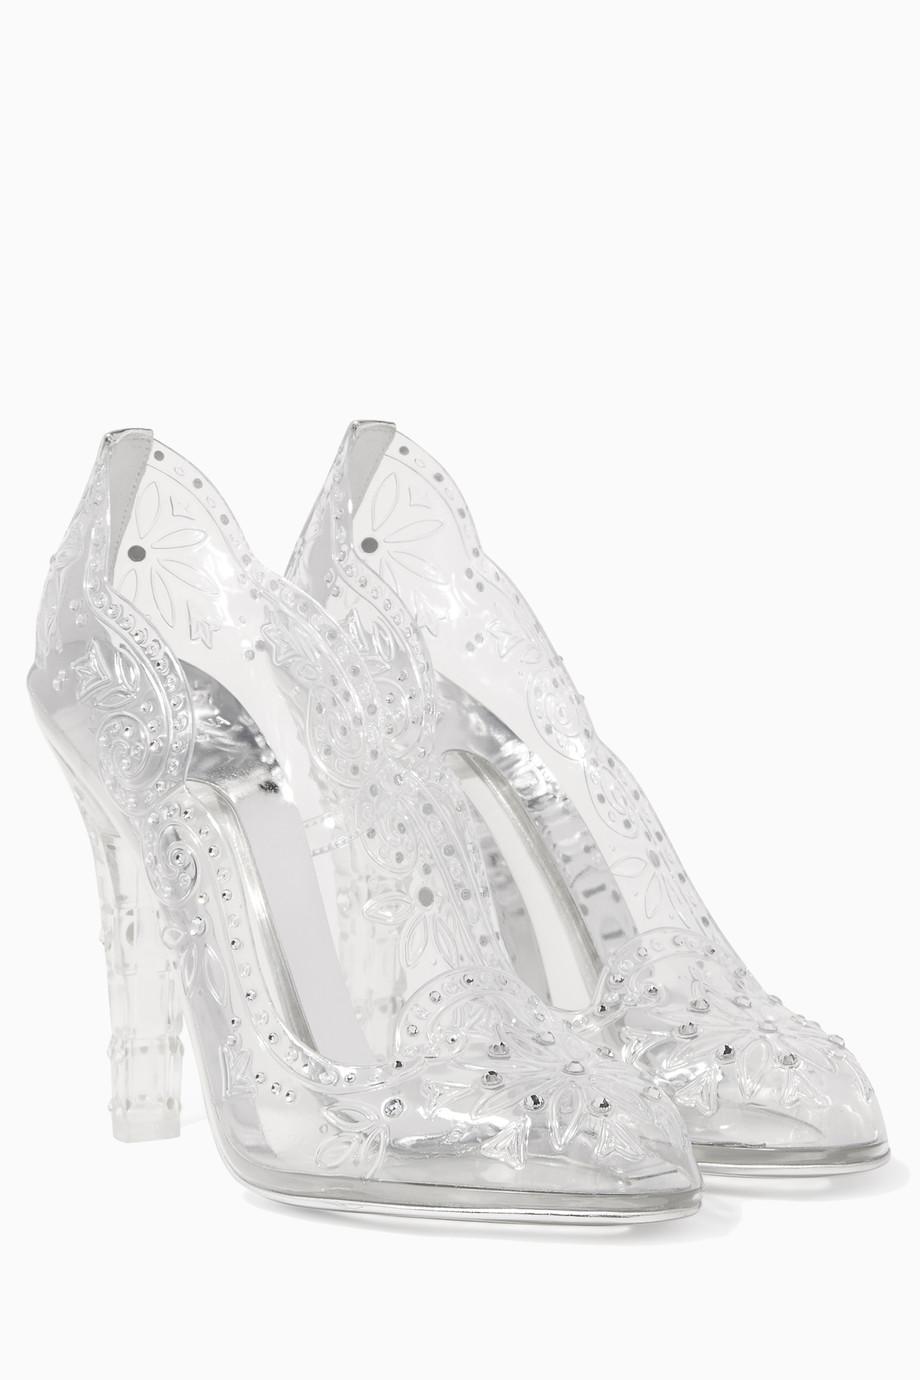 bc68d5717ff8 Shop Dolce   Gabbana Neutral Clear Crystal-Embellished Cinderella ...